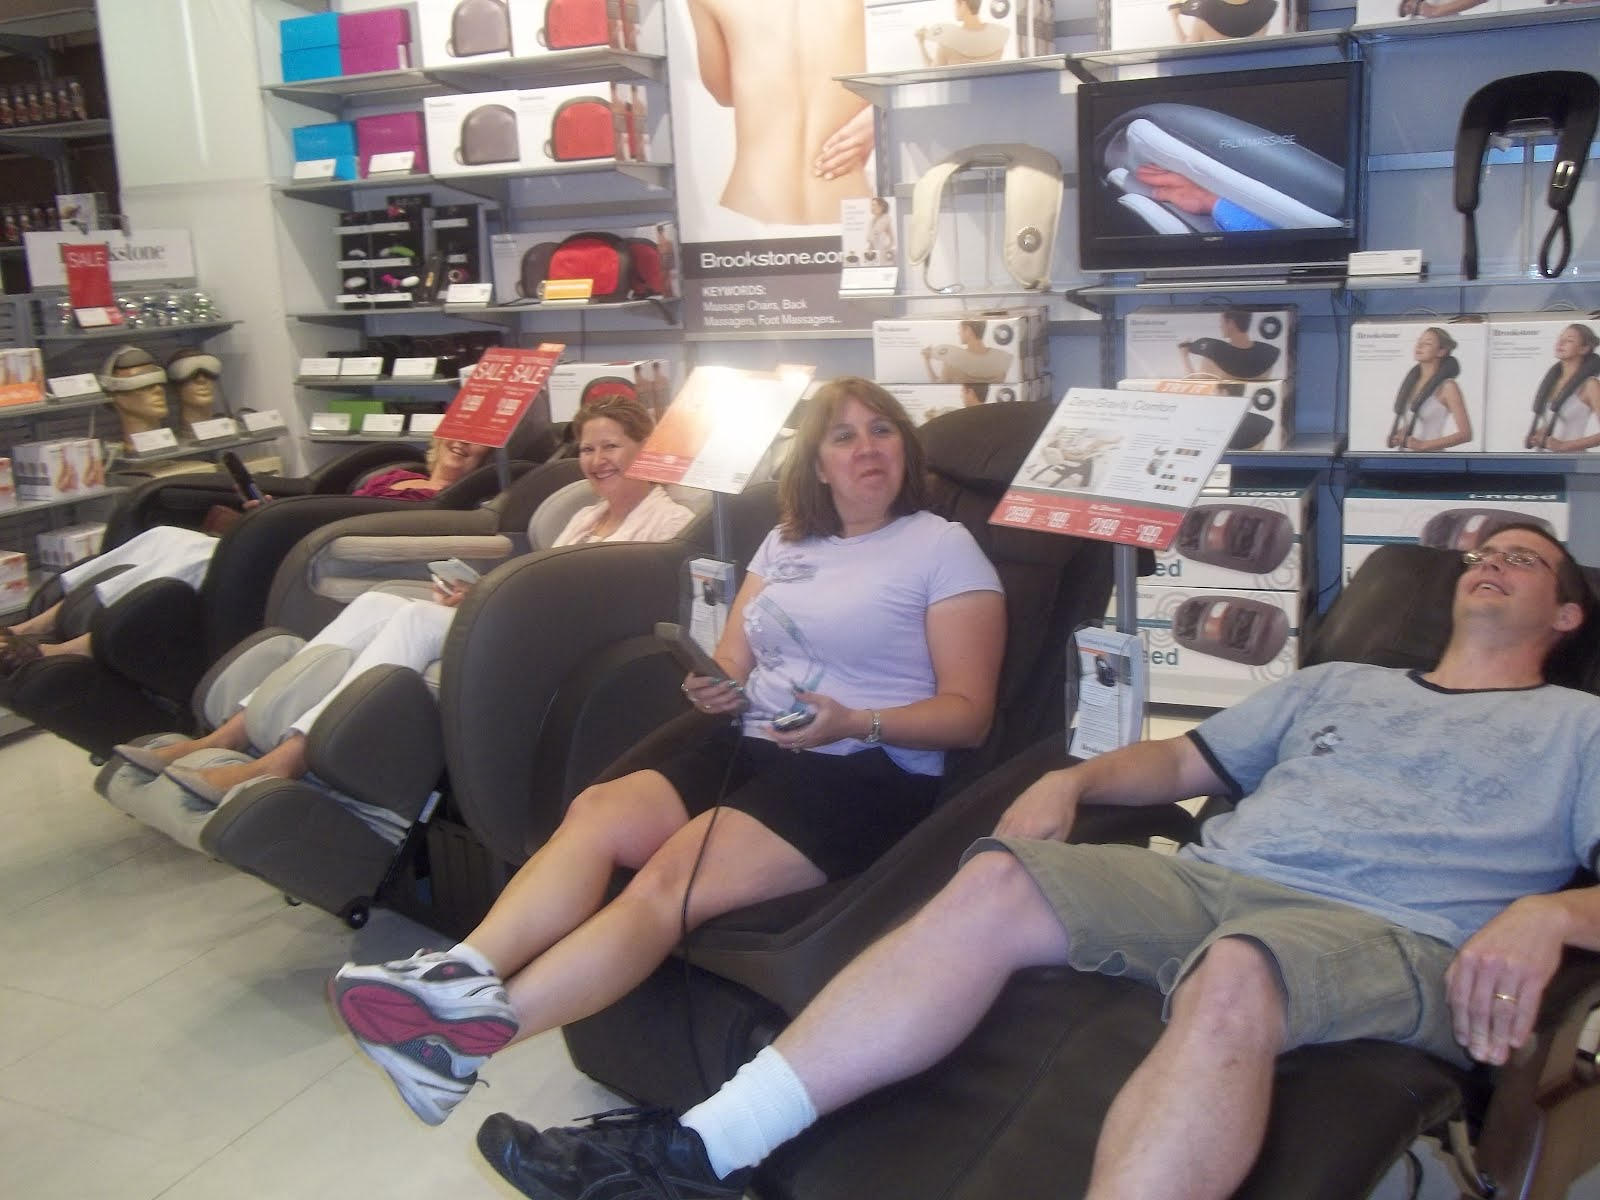 Used Brookstone Massage Chair Covers In Uganda Sarah 39s Blog Of Fun July 2012